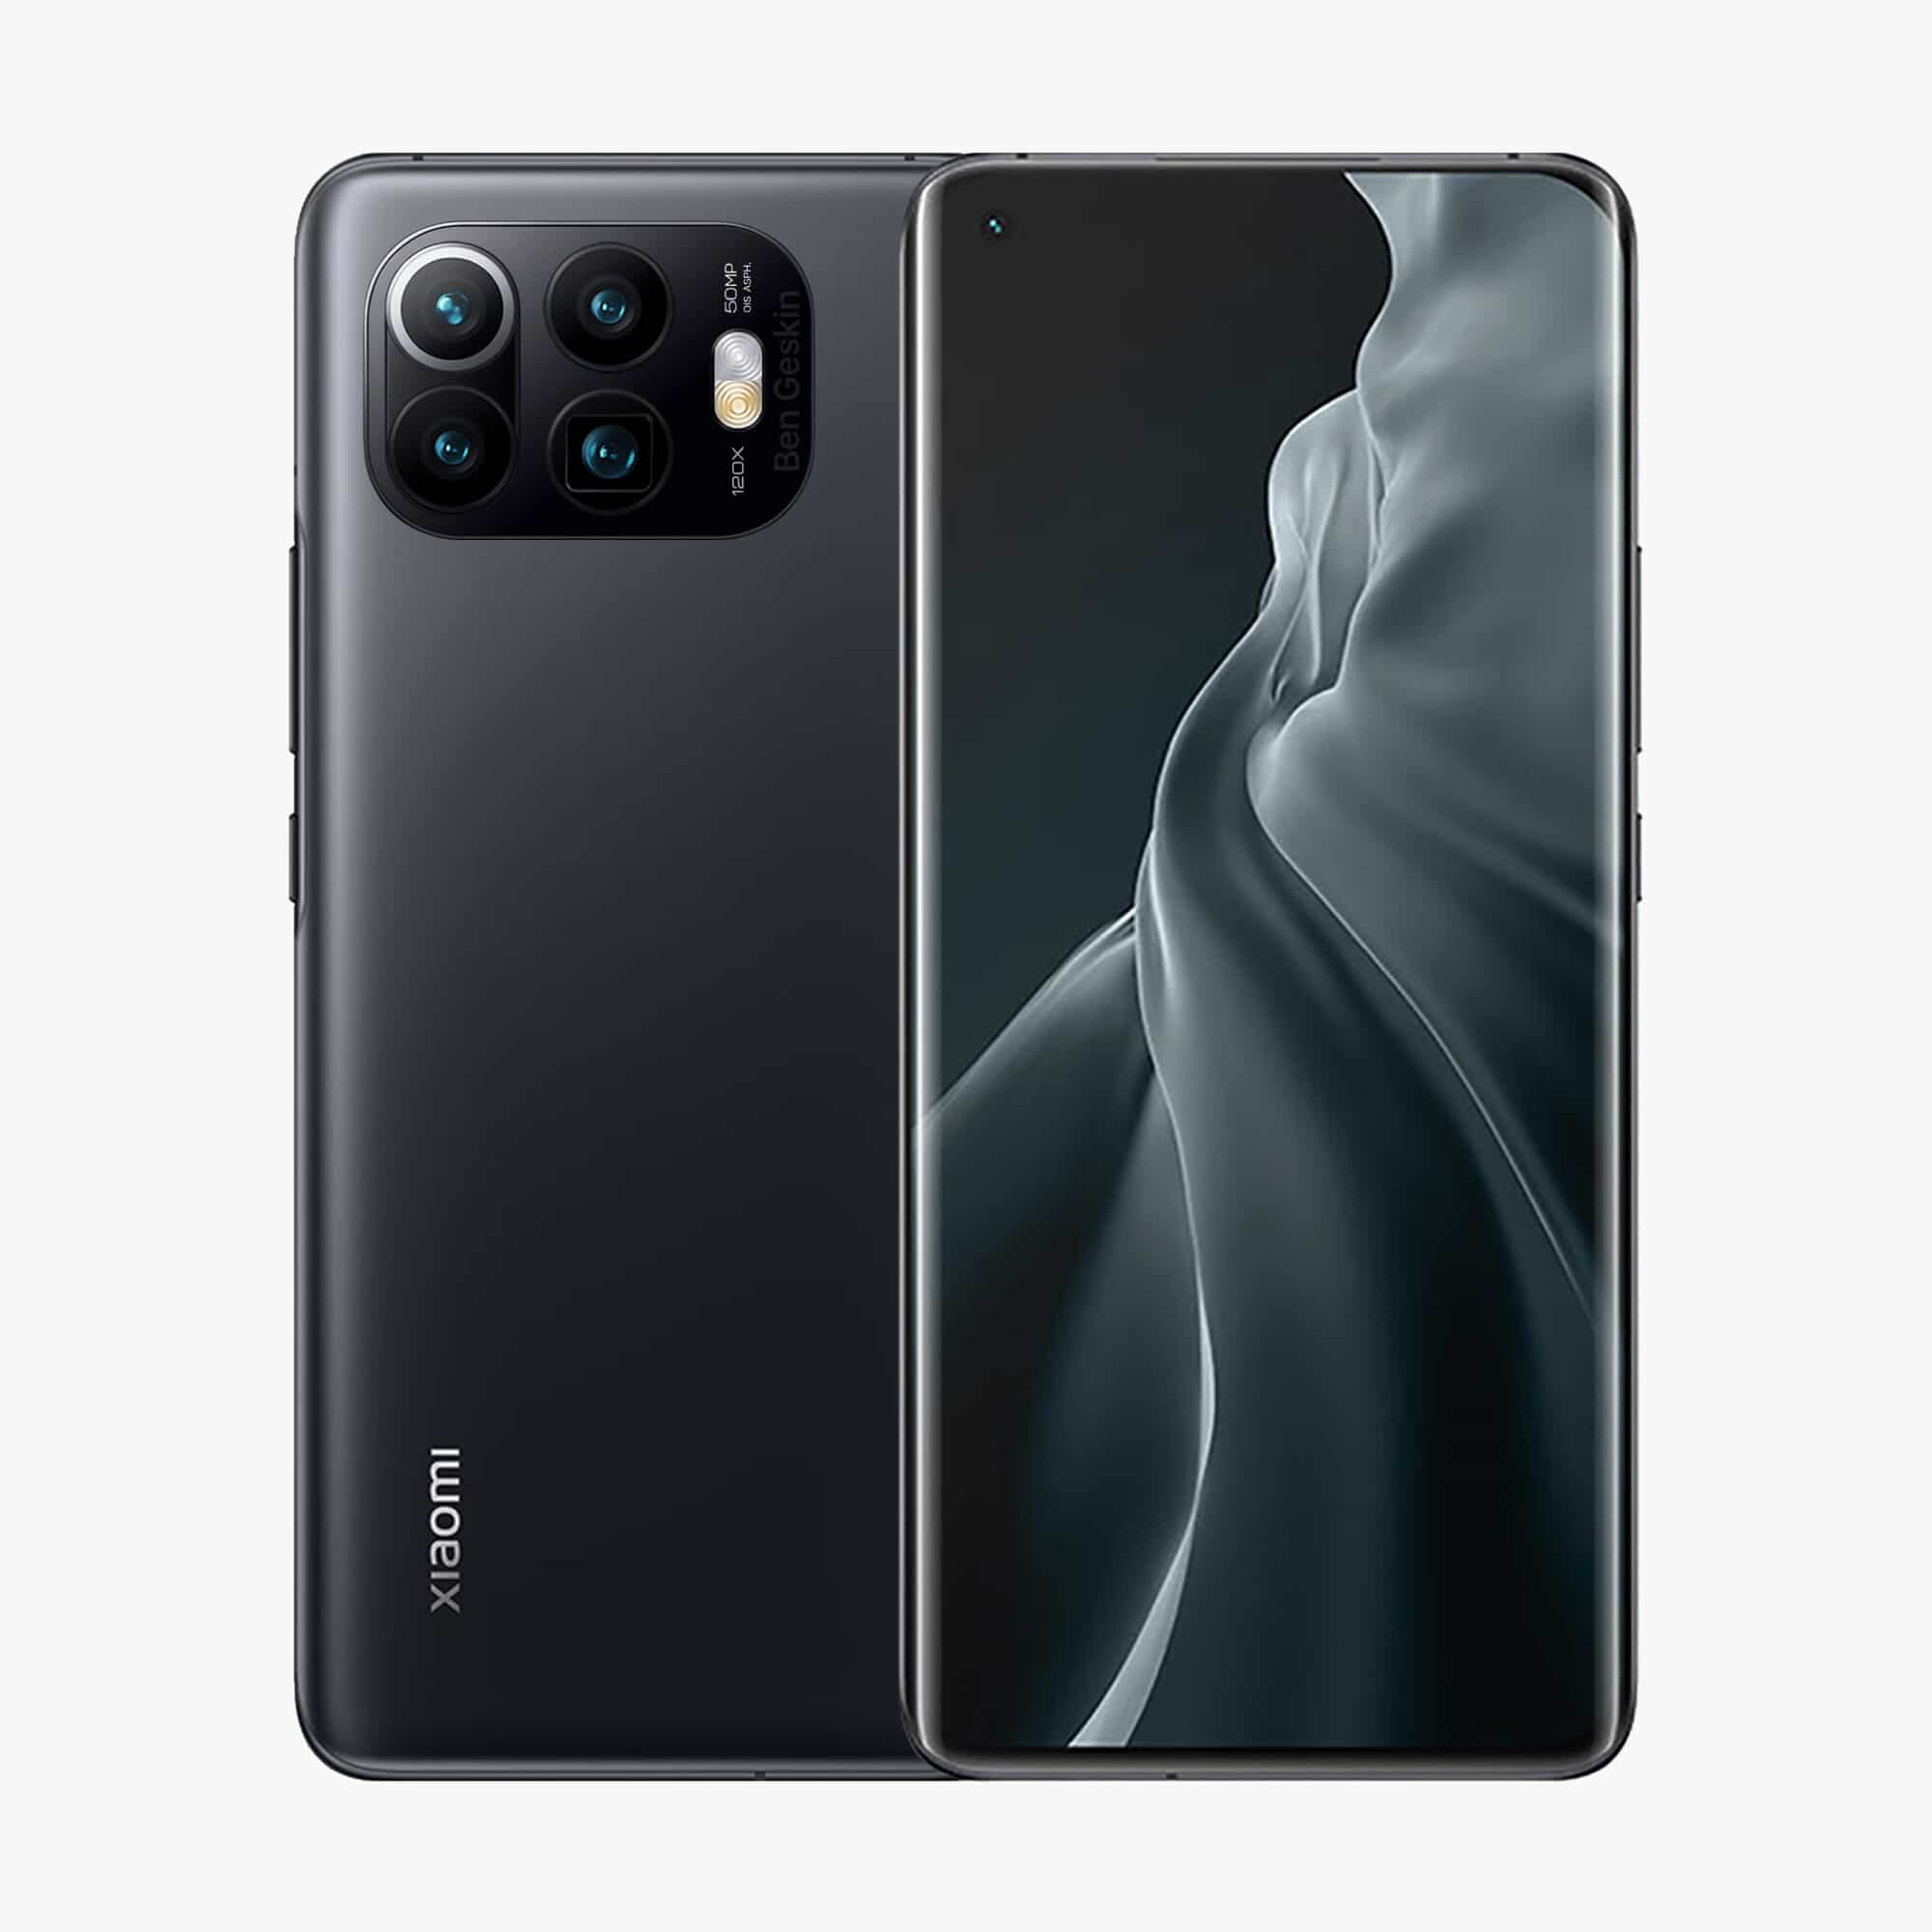 xiaomi-mi-11-pro-design-smartphone